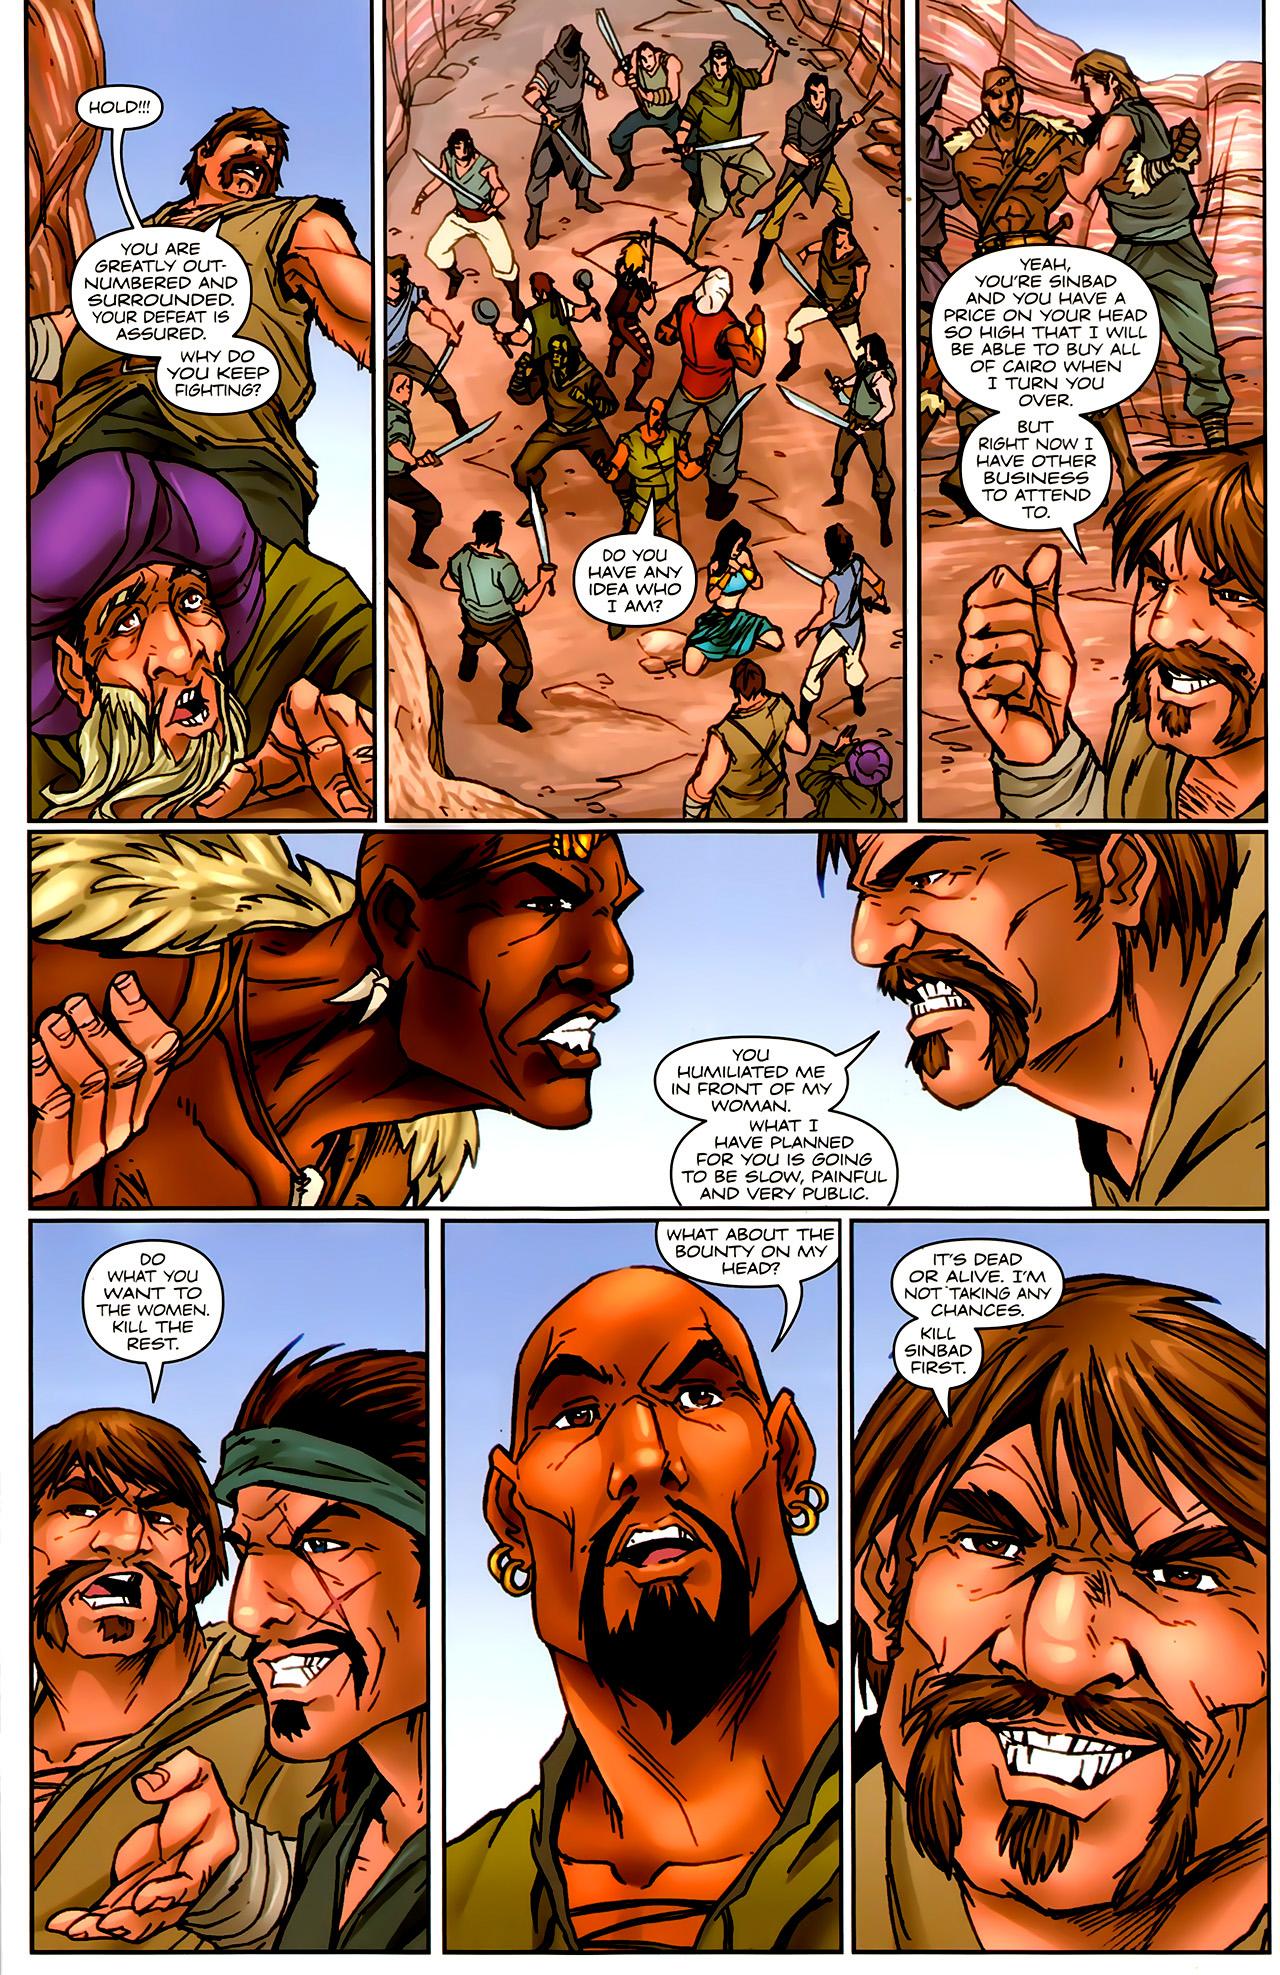 Read online 1001 Arabian Nights: The Adventures of Sinbad comic -  Issue #9 - 19